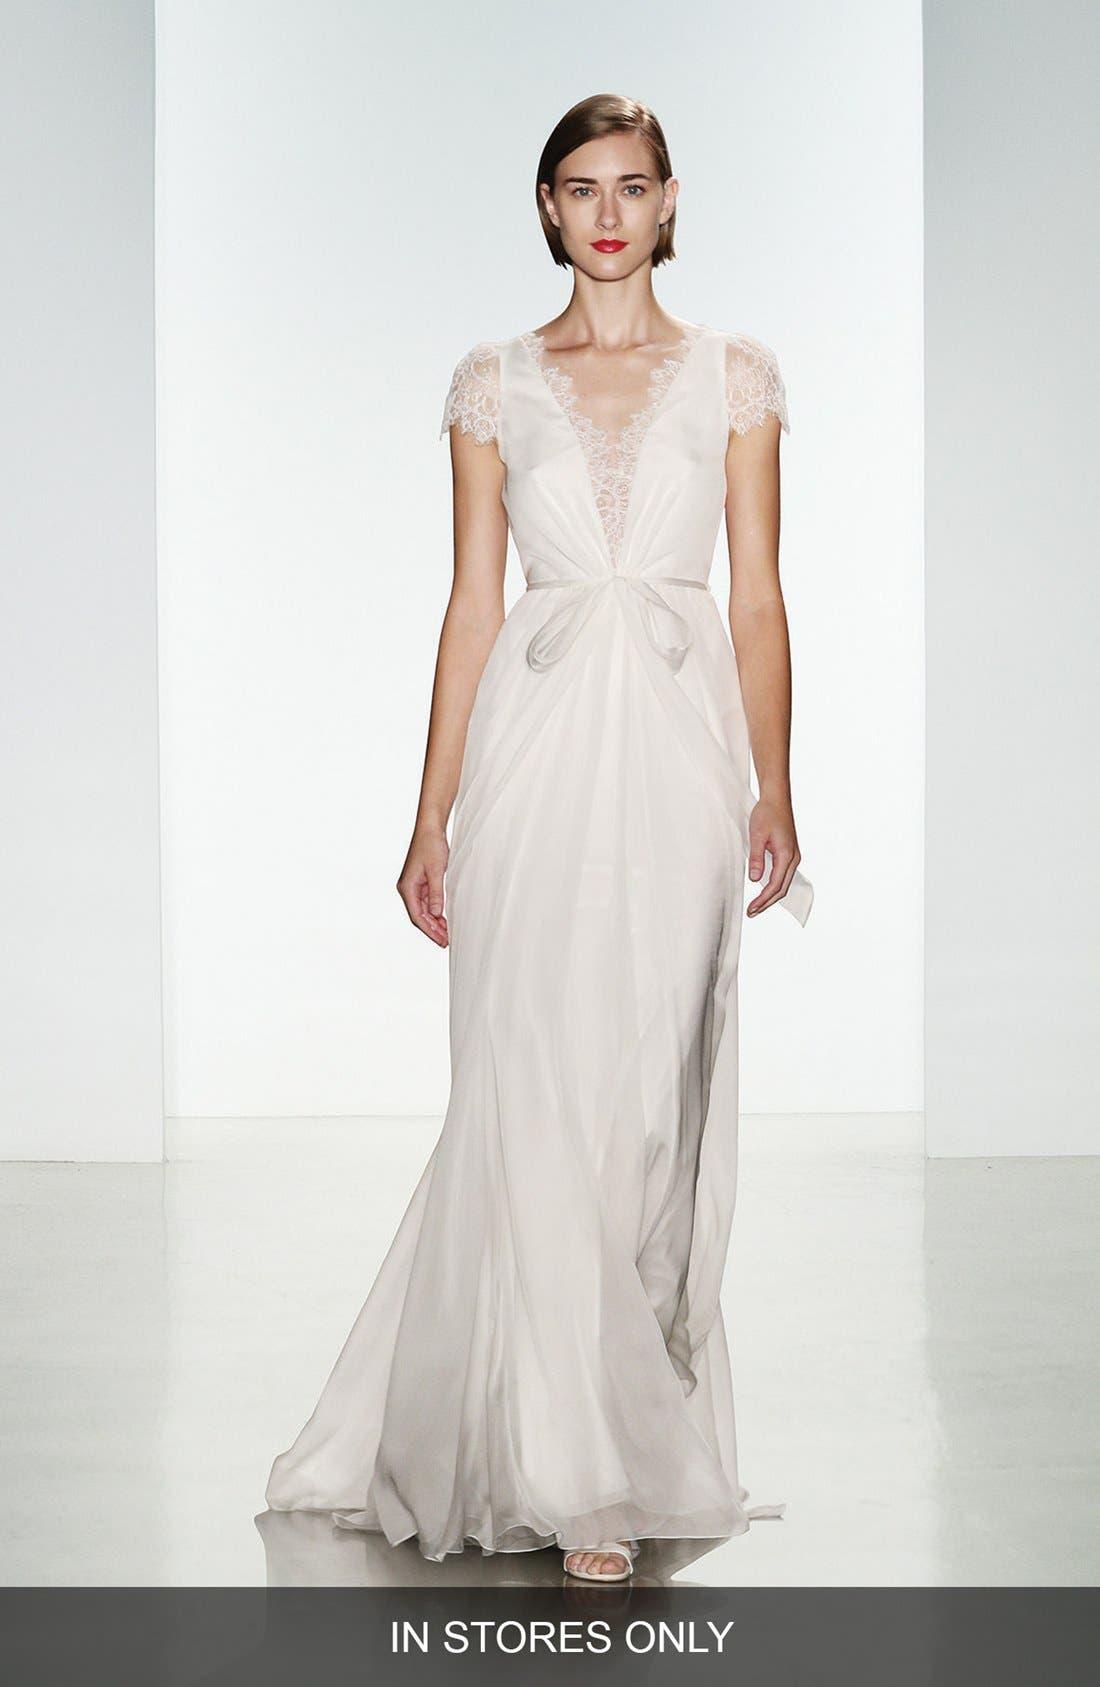 CHRISTOS BRIDAL 'Lainee' Silk Chiffon & Lace Cap